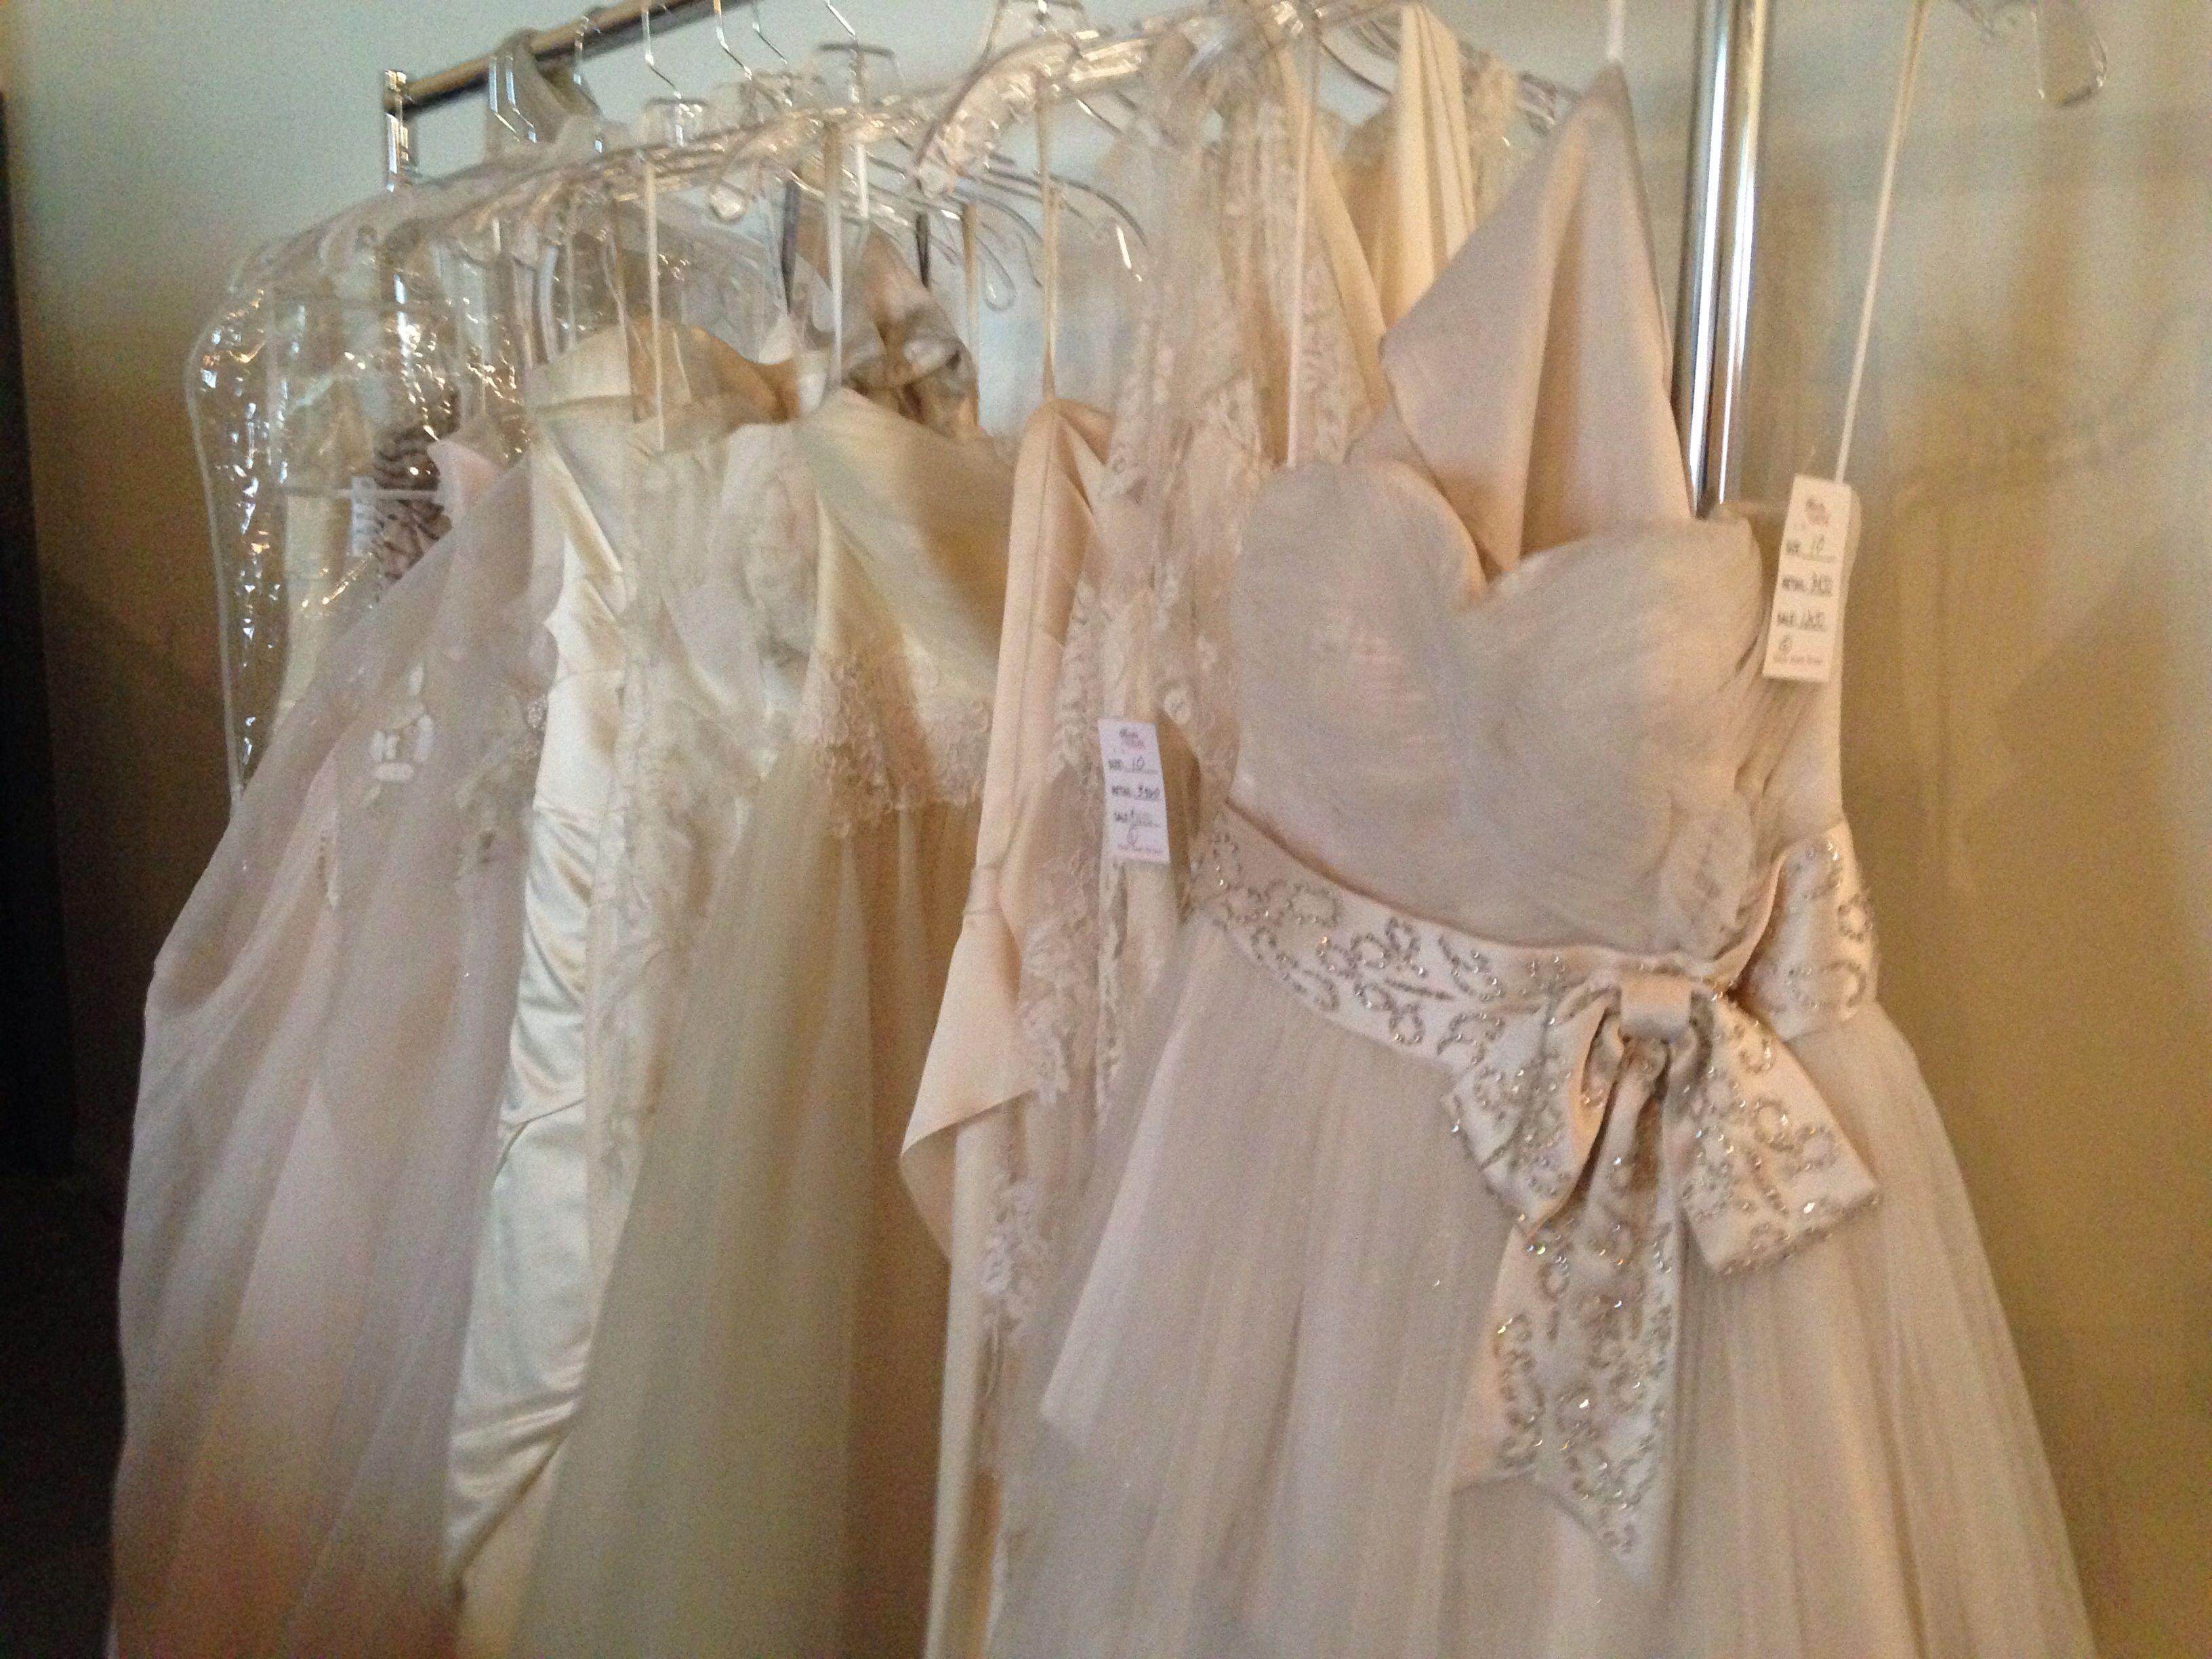 Wedding dress donation  New wedding dress donation by Gabrielleus Bridal in New York